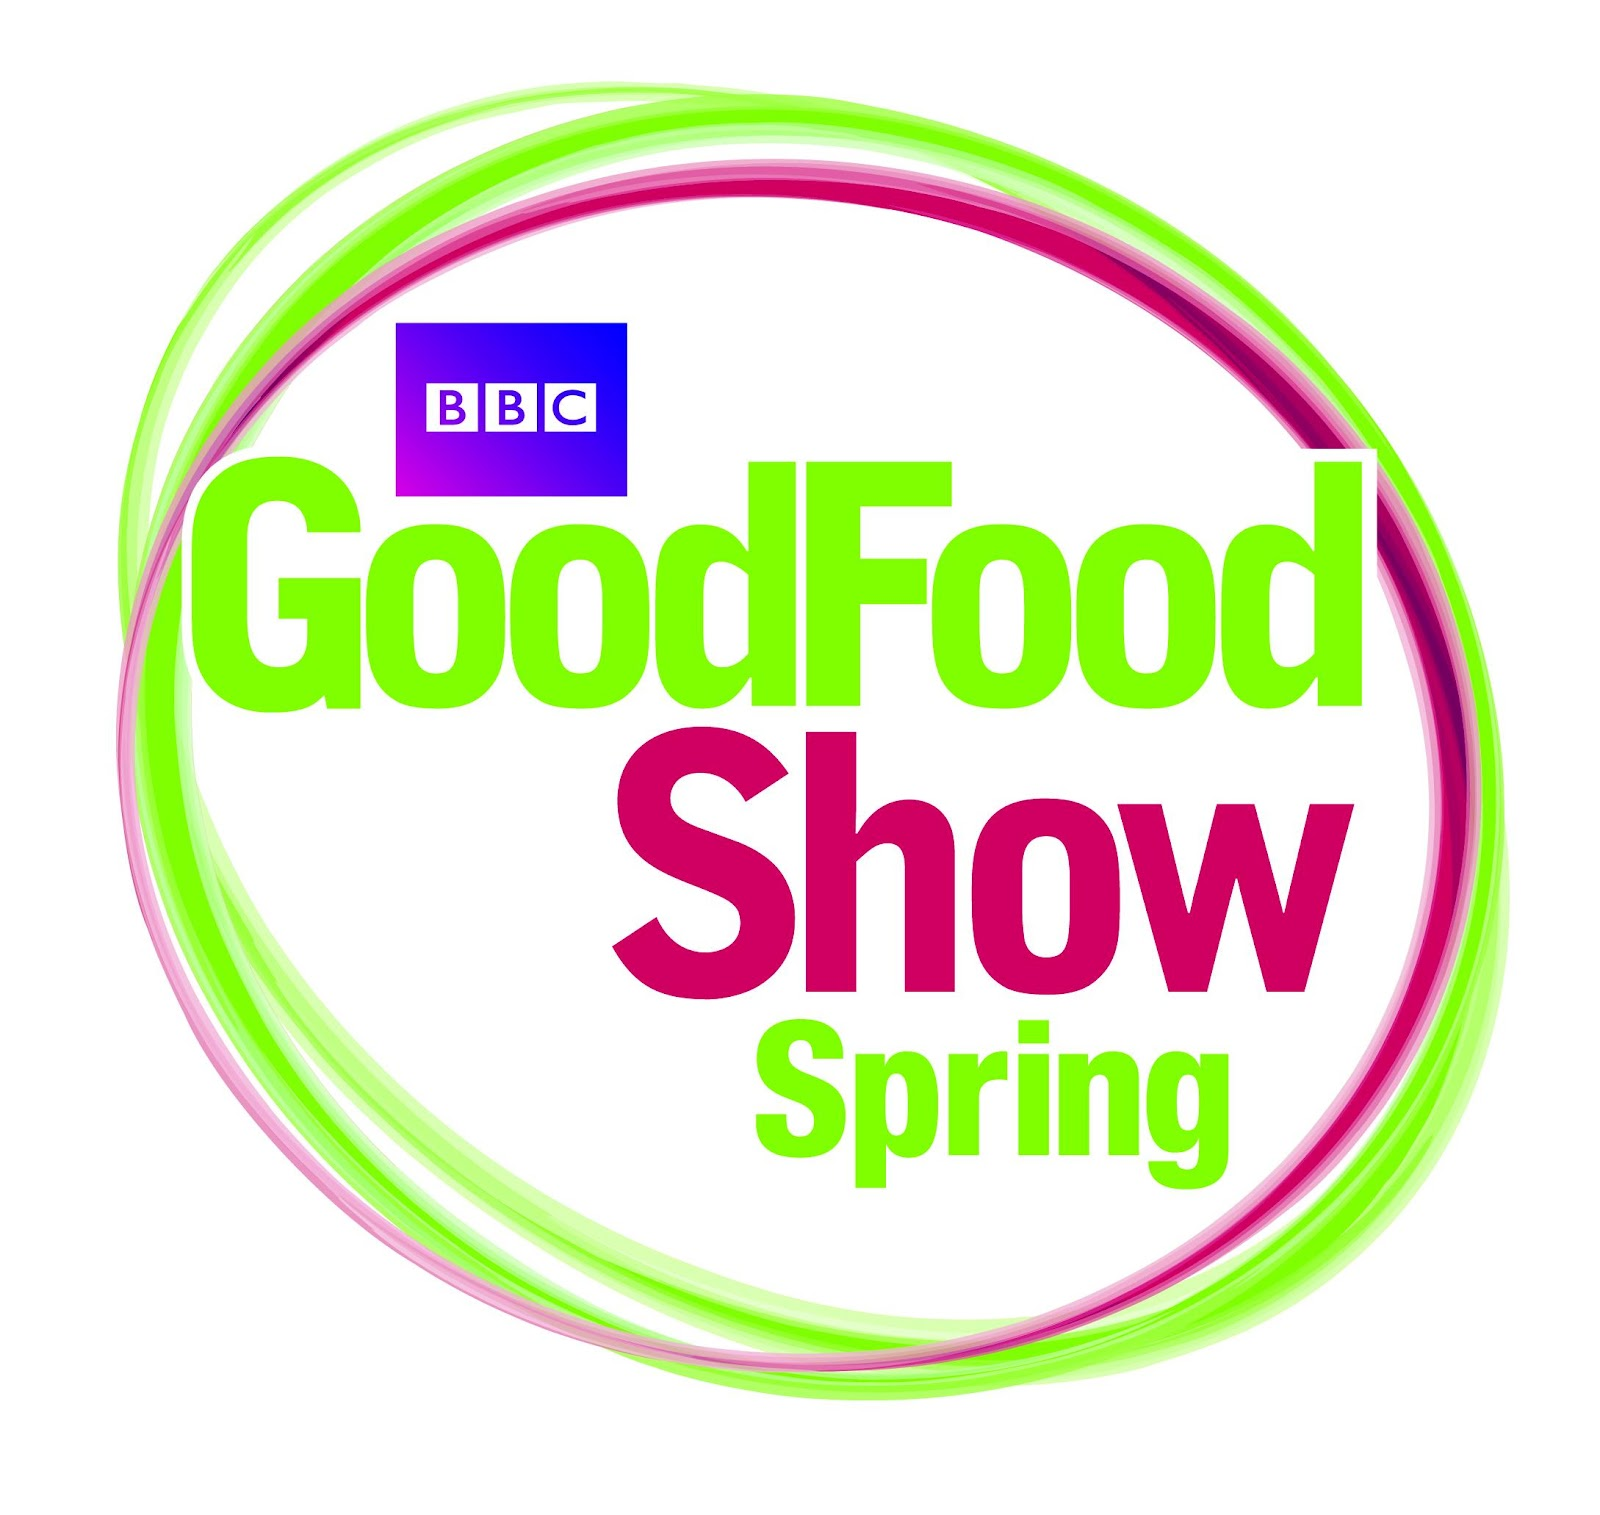 Win Good Food Show Tickets